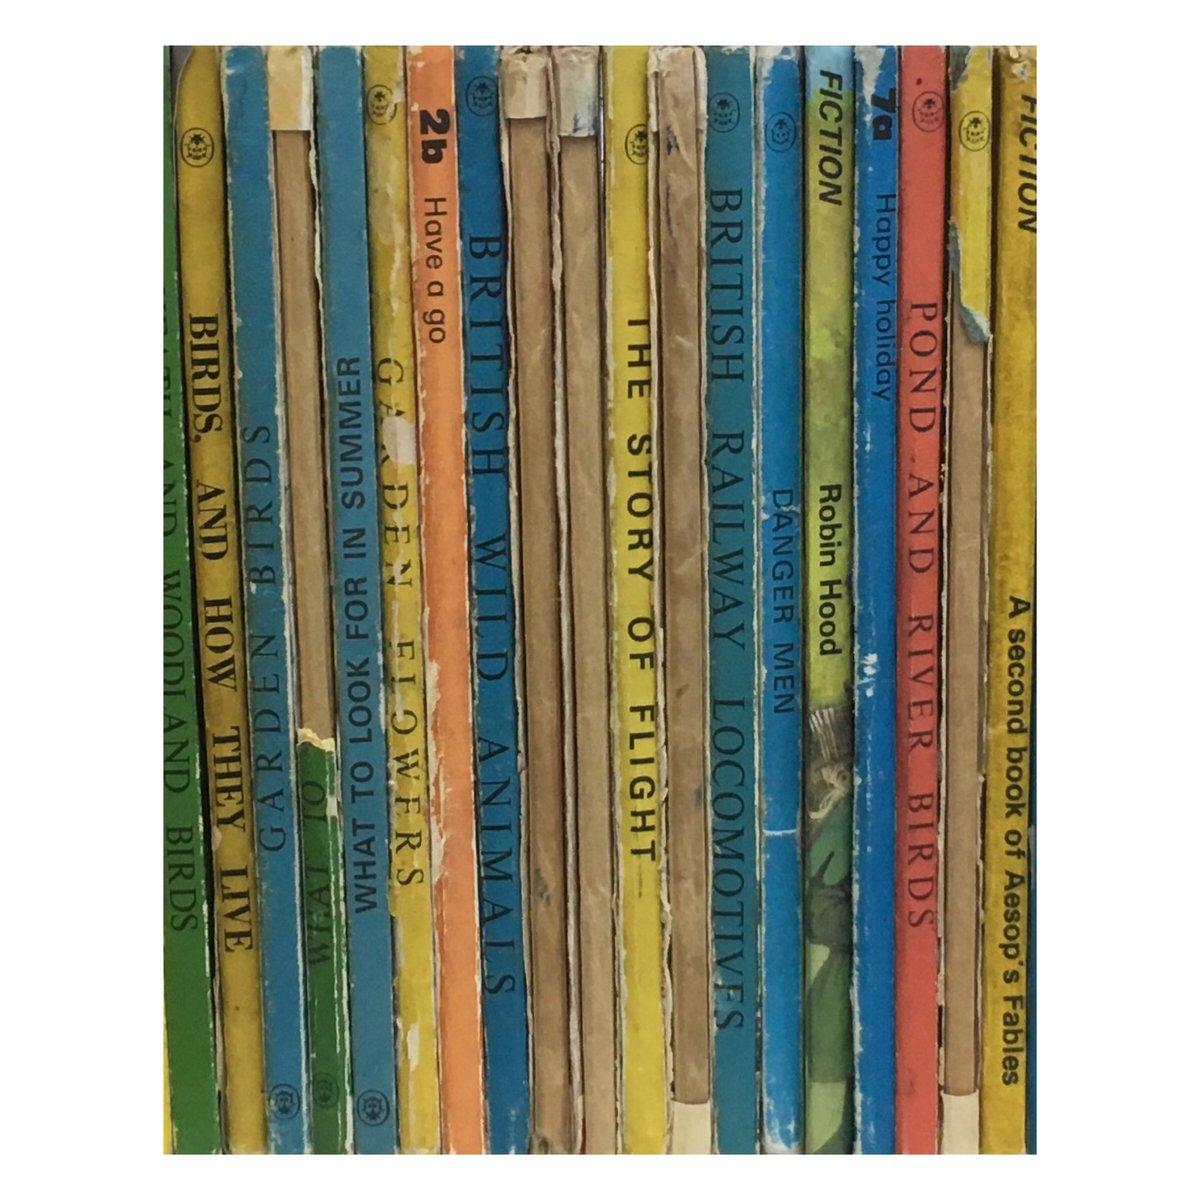 Childhood books,the illustrations still bring me joy today #ladybirdbooks #Illustrator #illustrations #artist https://t.co/7C6sEkOUtw